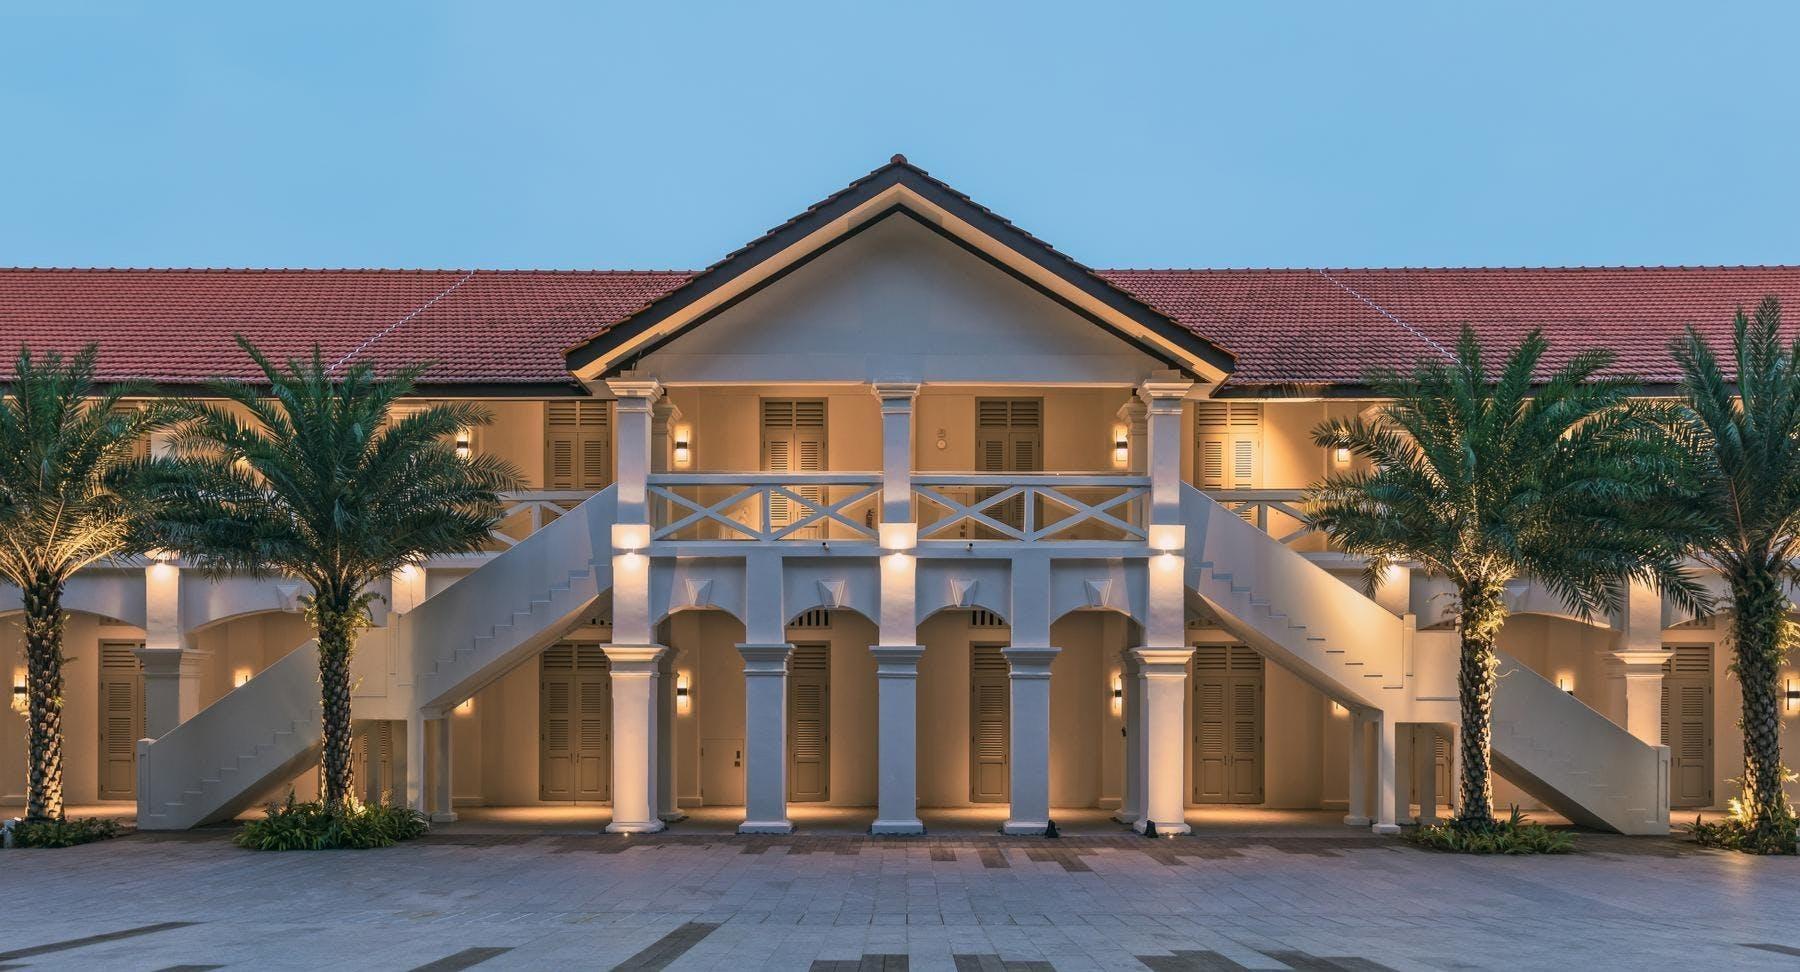 Royal Taj at Village Hotel Singapore image 1